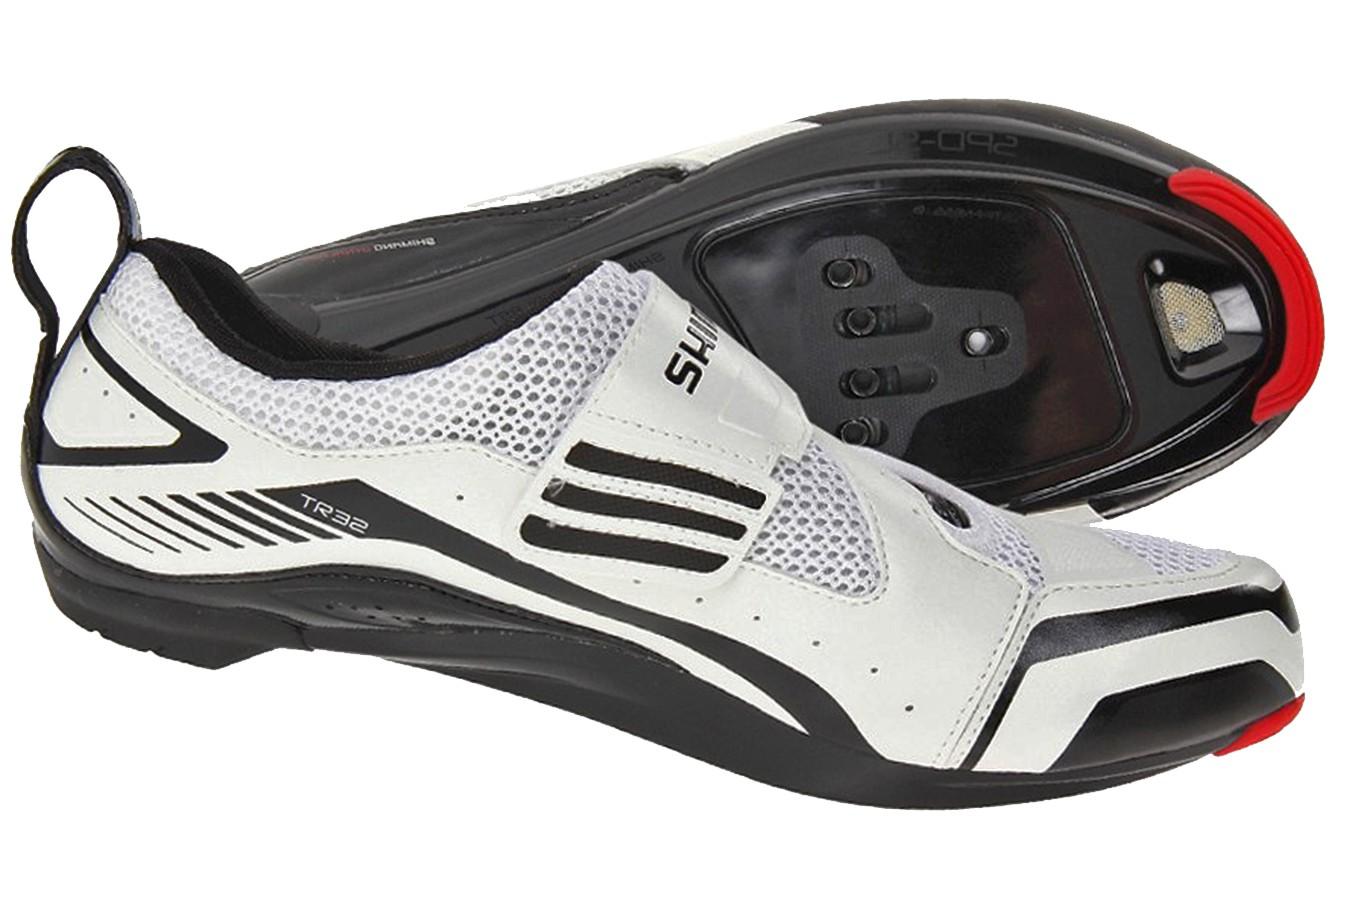 Sapatilha Triathlon Shimano Sh-tr32